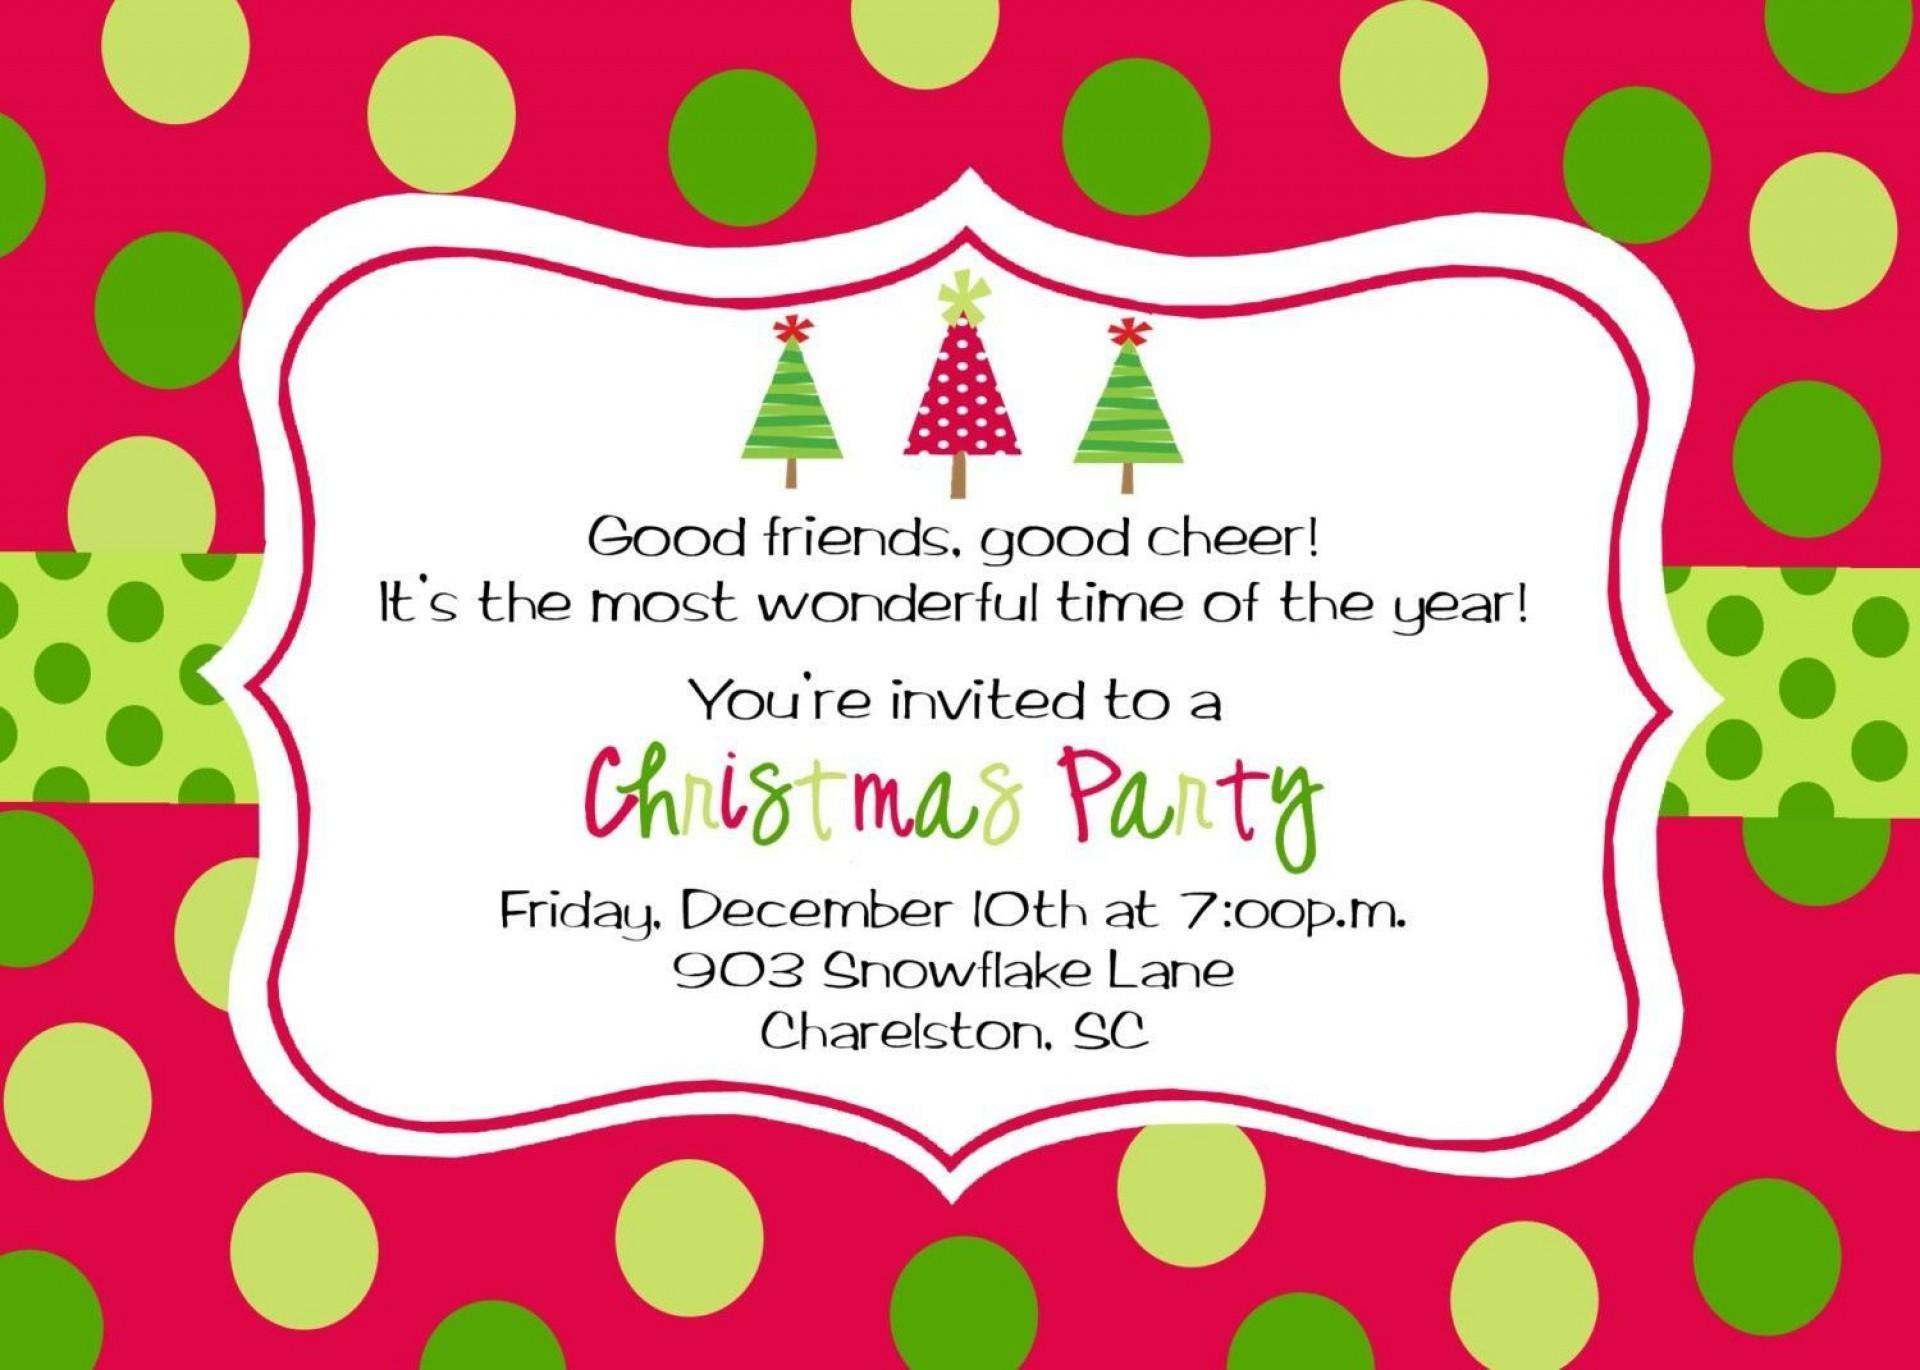 009 Wondrou Office Christma Party Invitation Wording Sample  Holiday Example1920